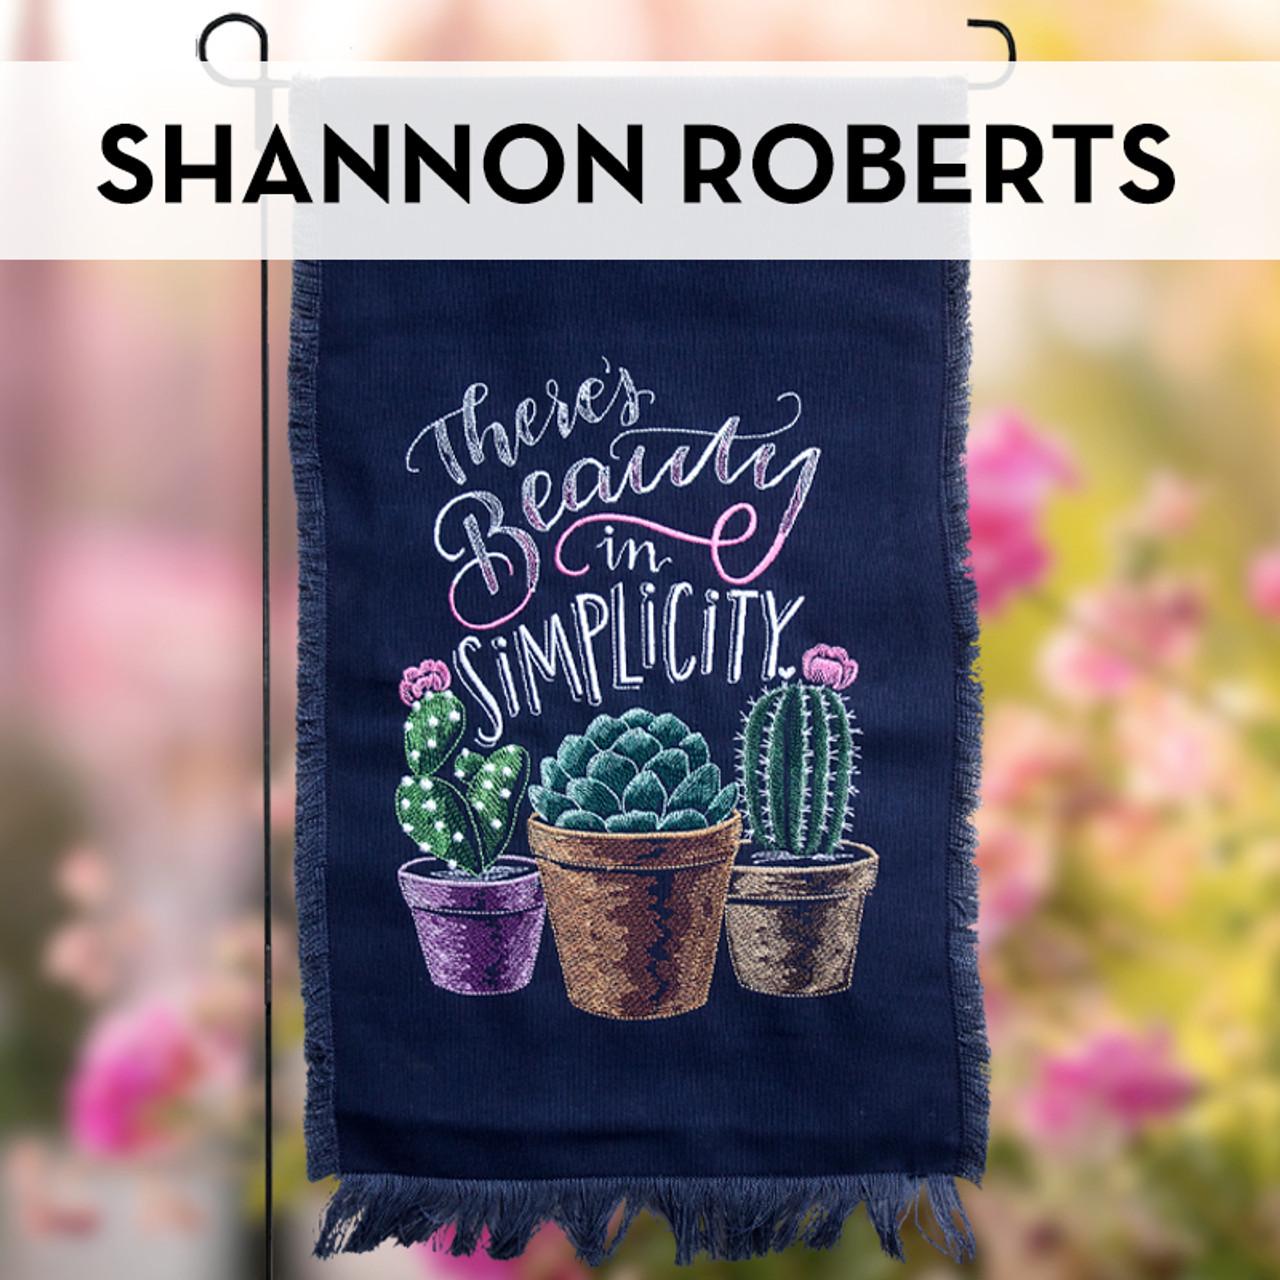 Shannon Roberts